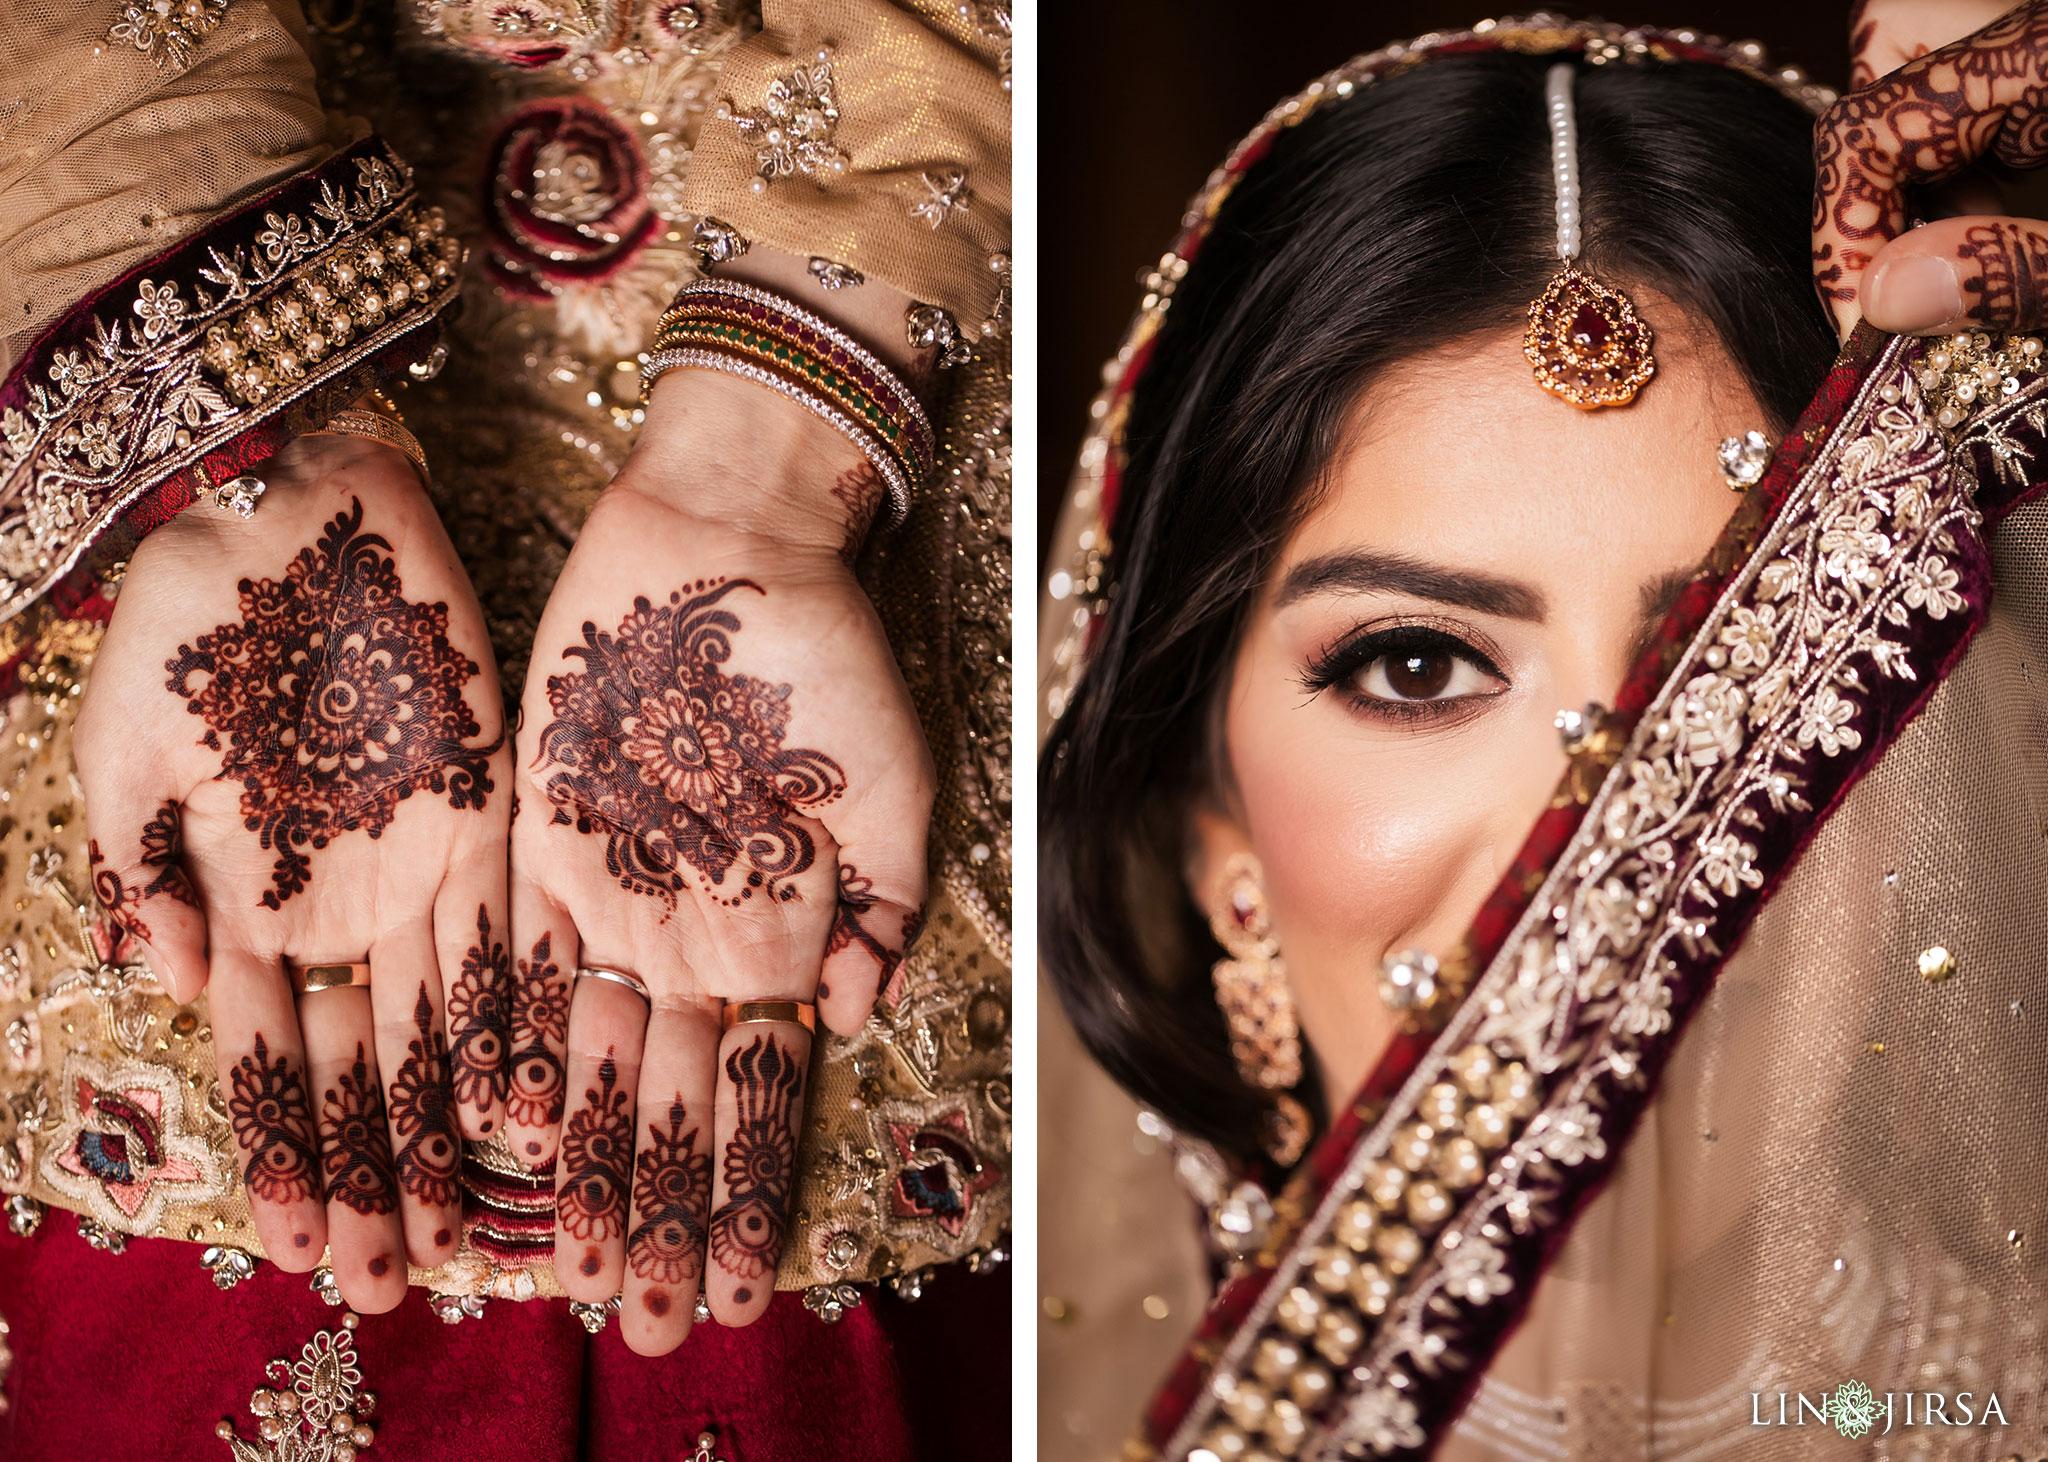 005 four seasons westlake village pakistani wedding photography